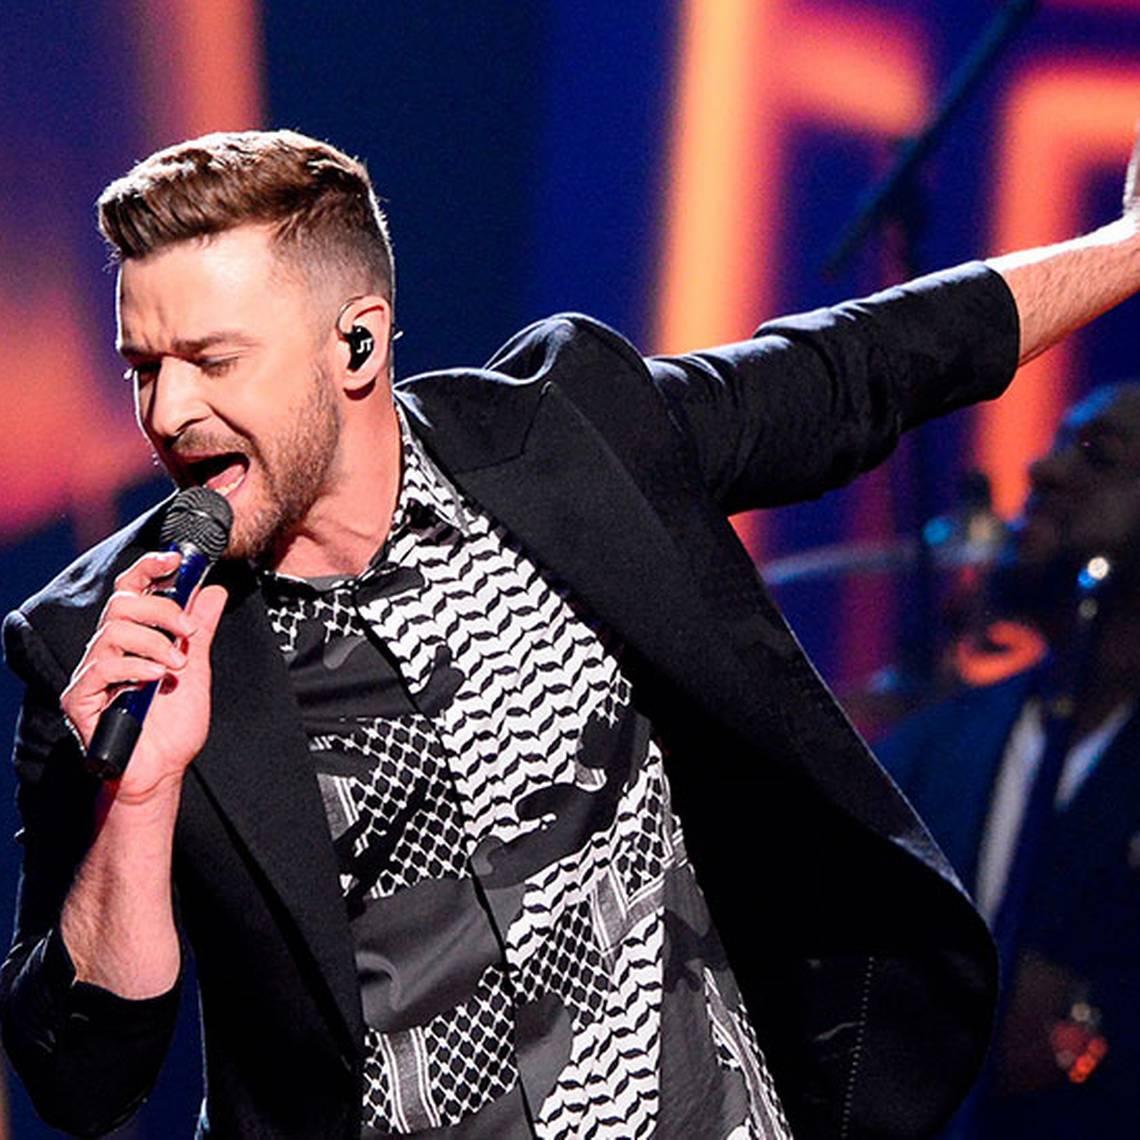 ¡Justin Timberlake ahora maneja una inteligencia artificial!